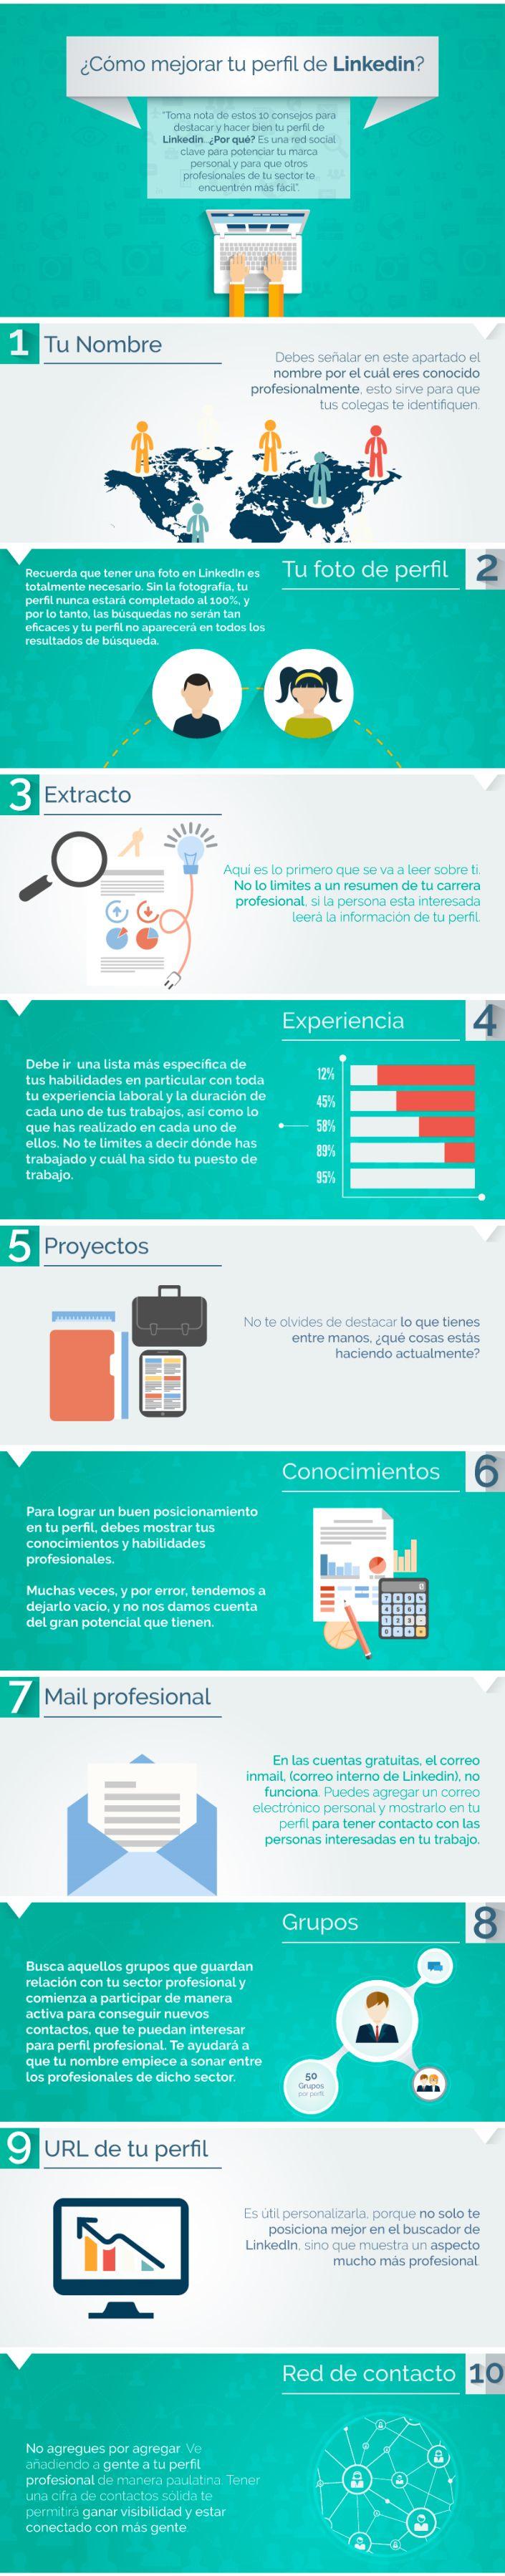 10 consejos para mejorar tu perfil de Linkedin #infografia